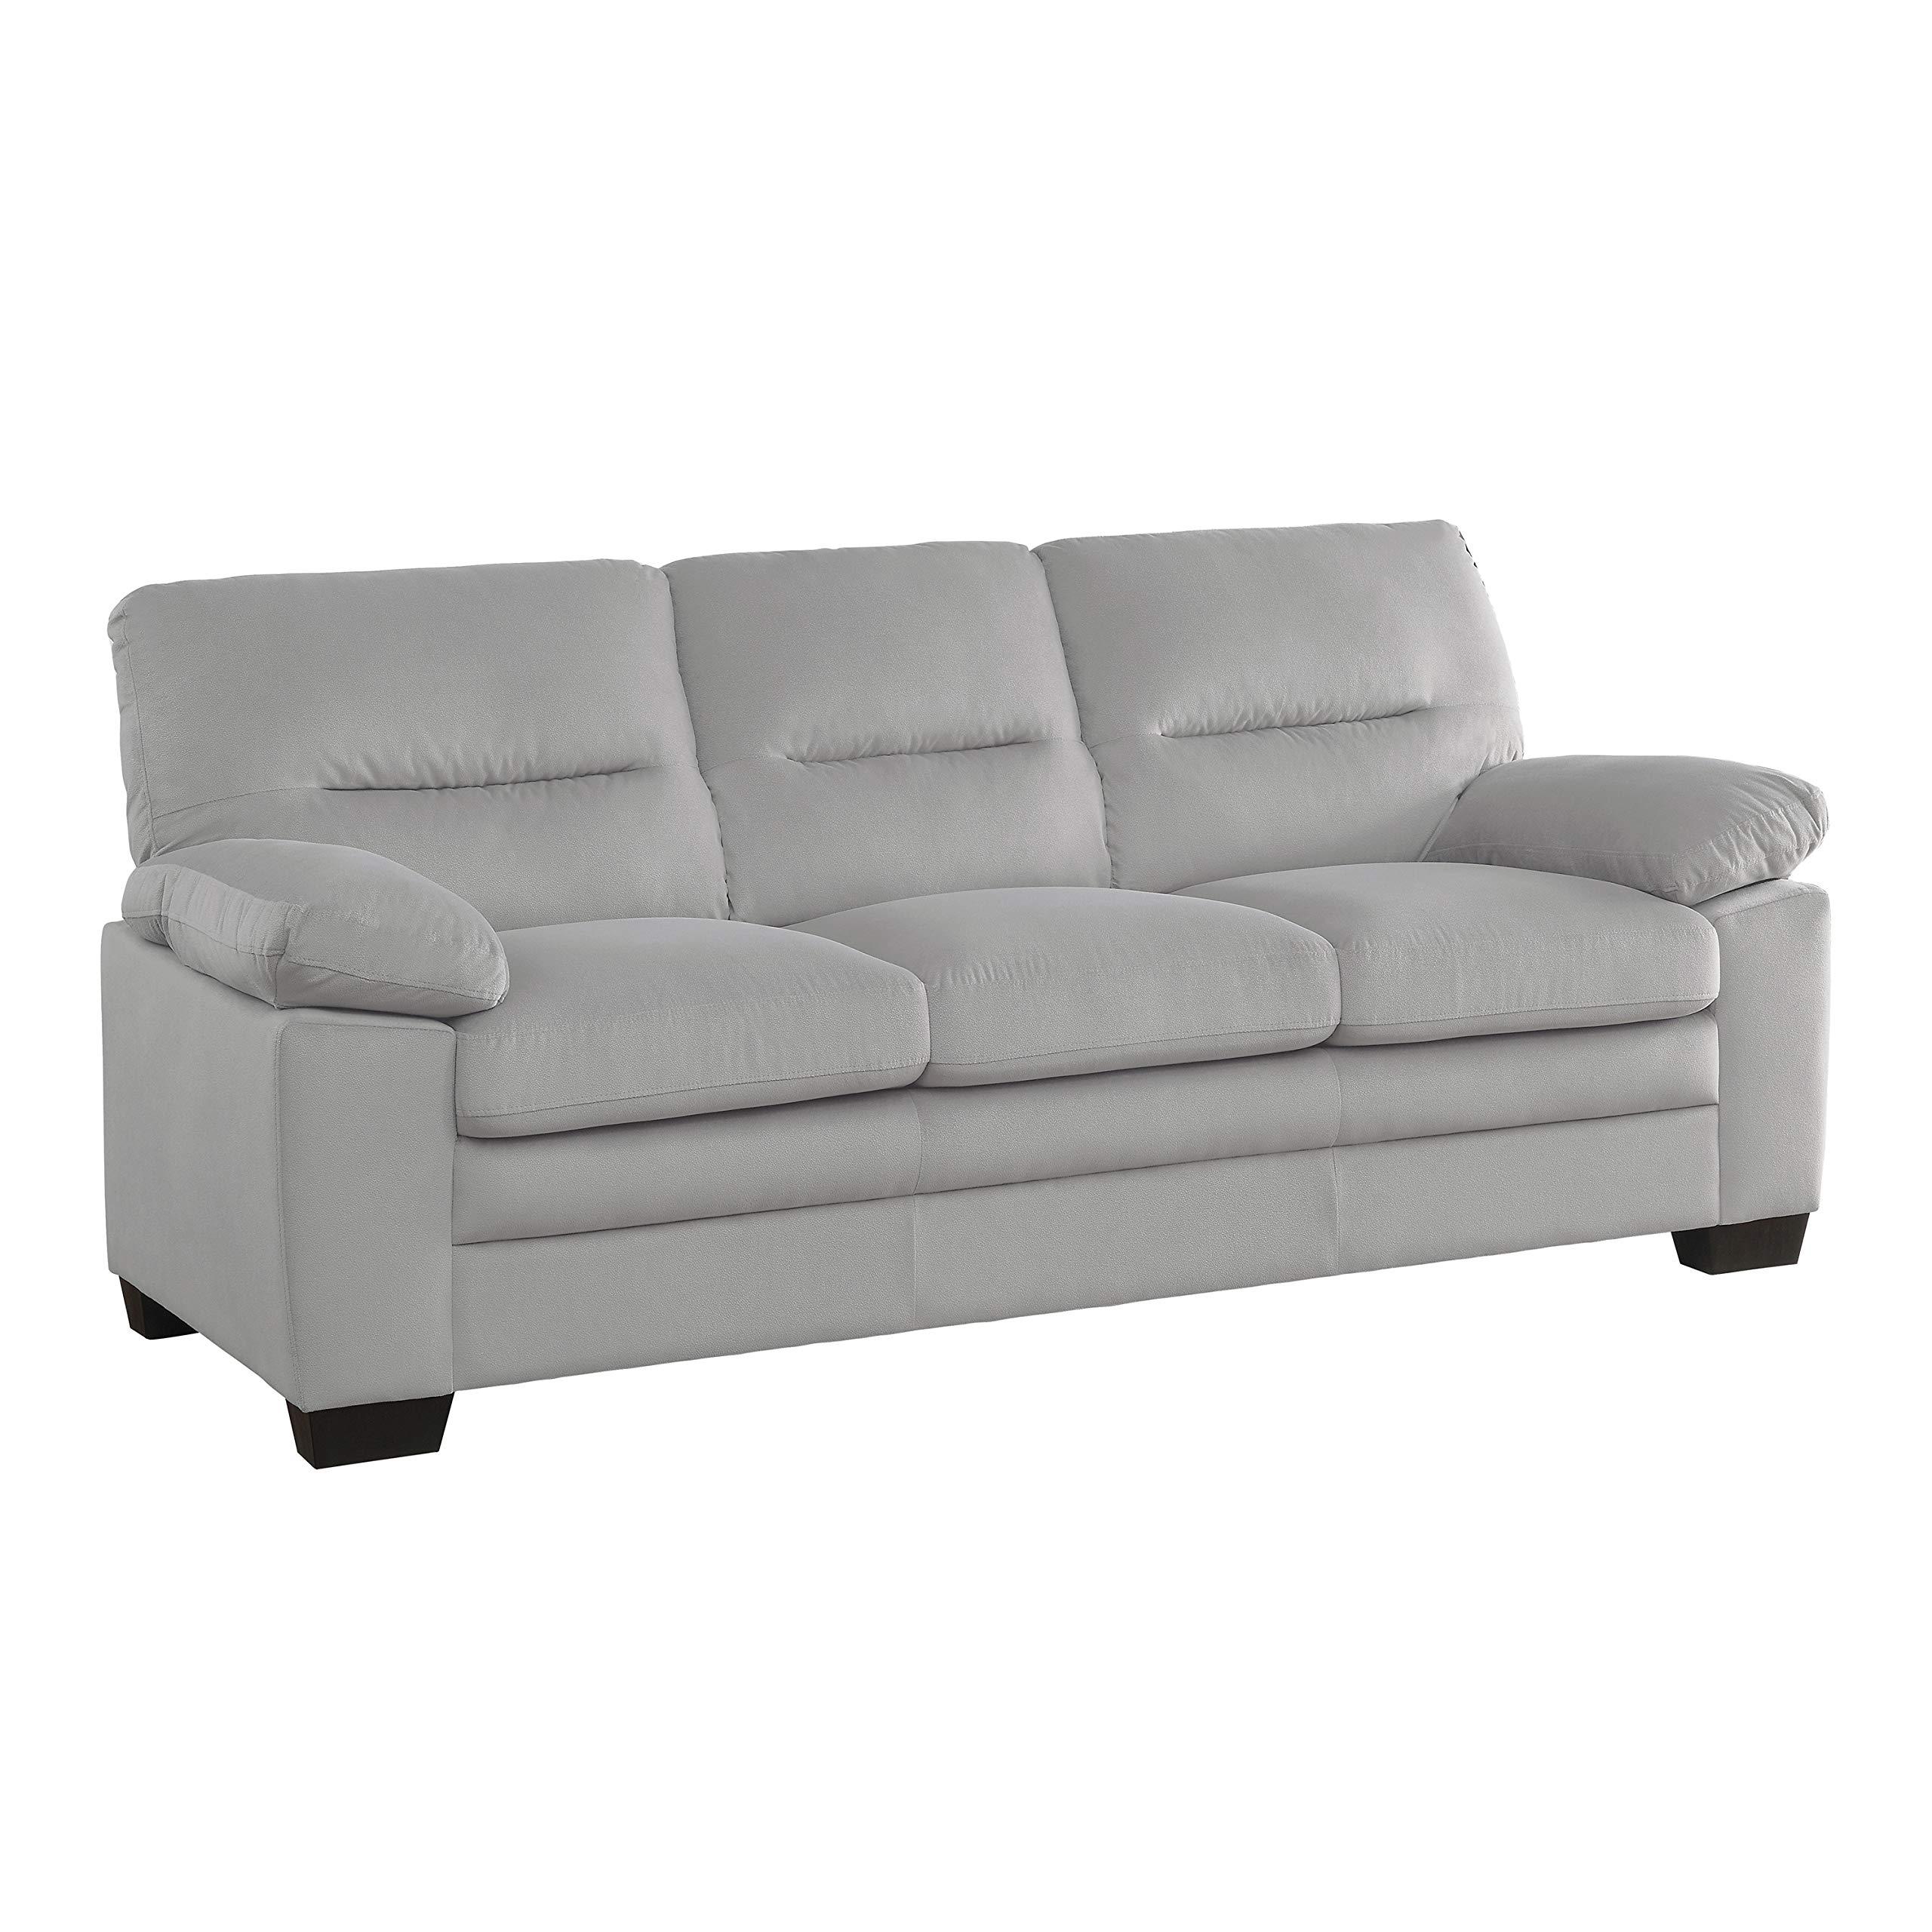 Lexicon Dawson Living Room Sofa, Gray